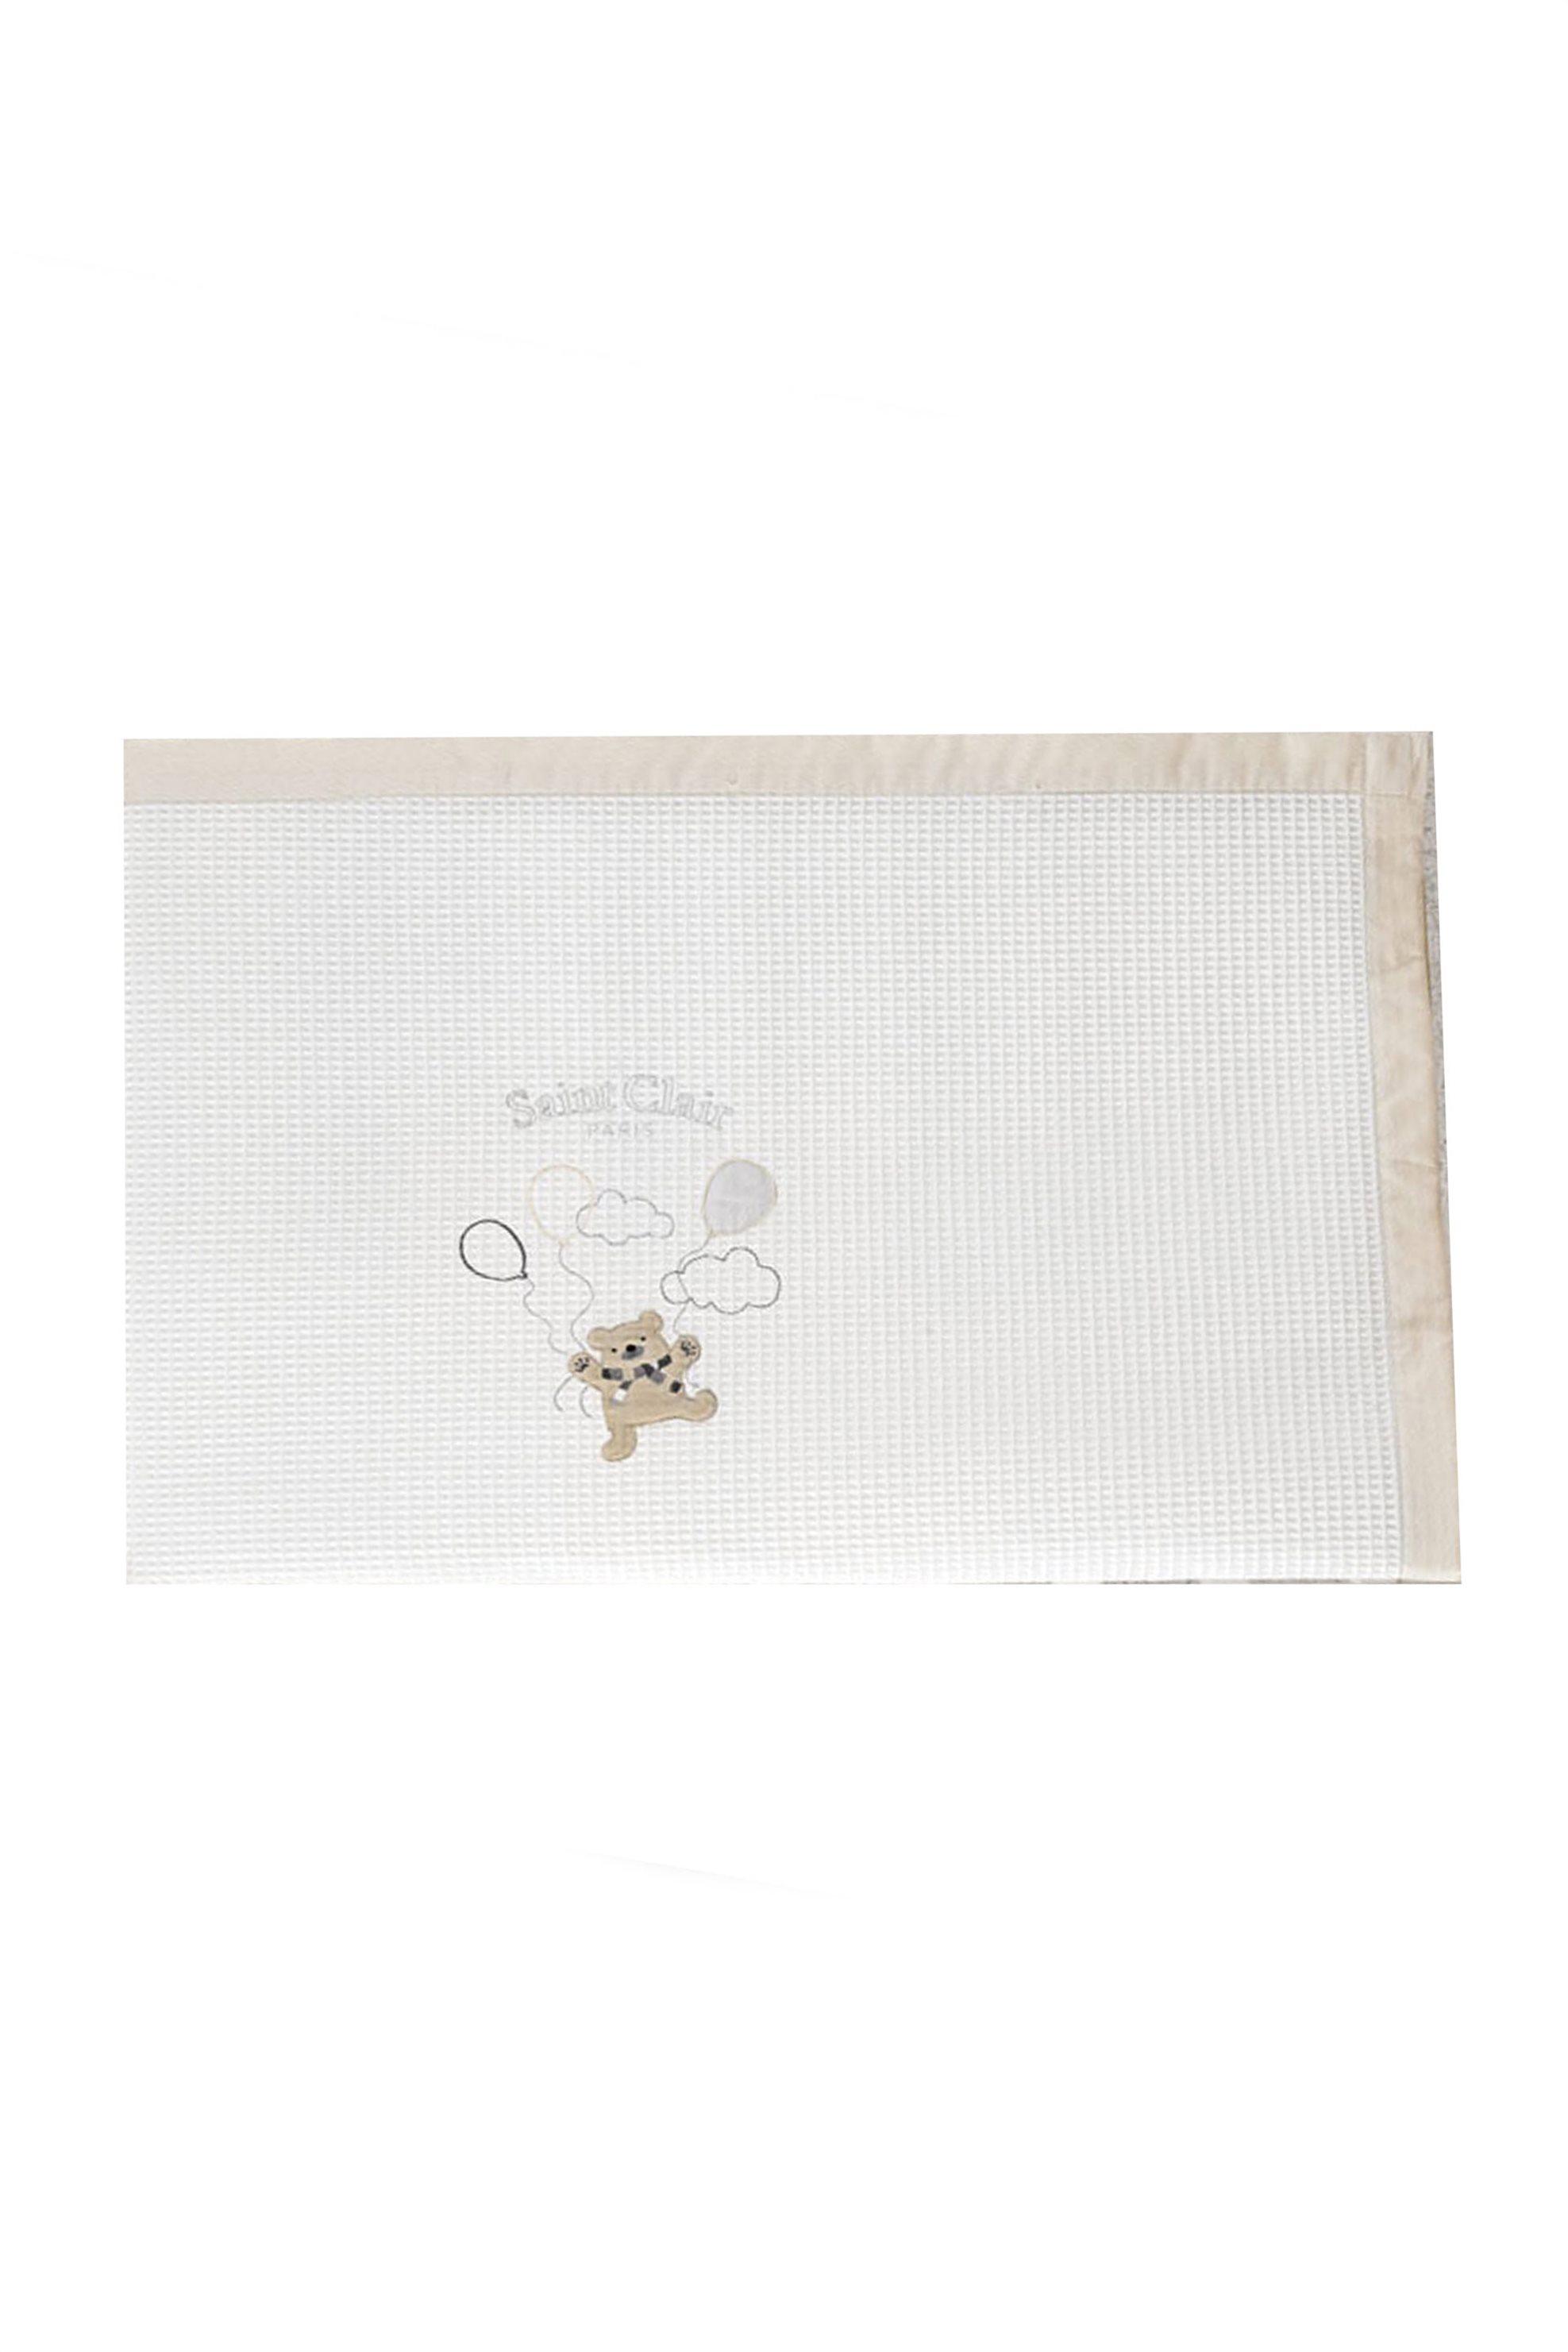 Saint Clair Paris Κουβέρτα πικέ για βρεφικό δωμάτιο Freddy 110 x 150 cm - 171309 home   παιδια   κουβέρτες